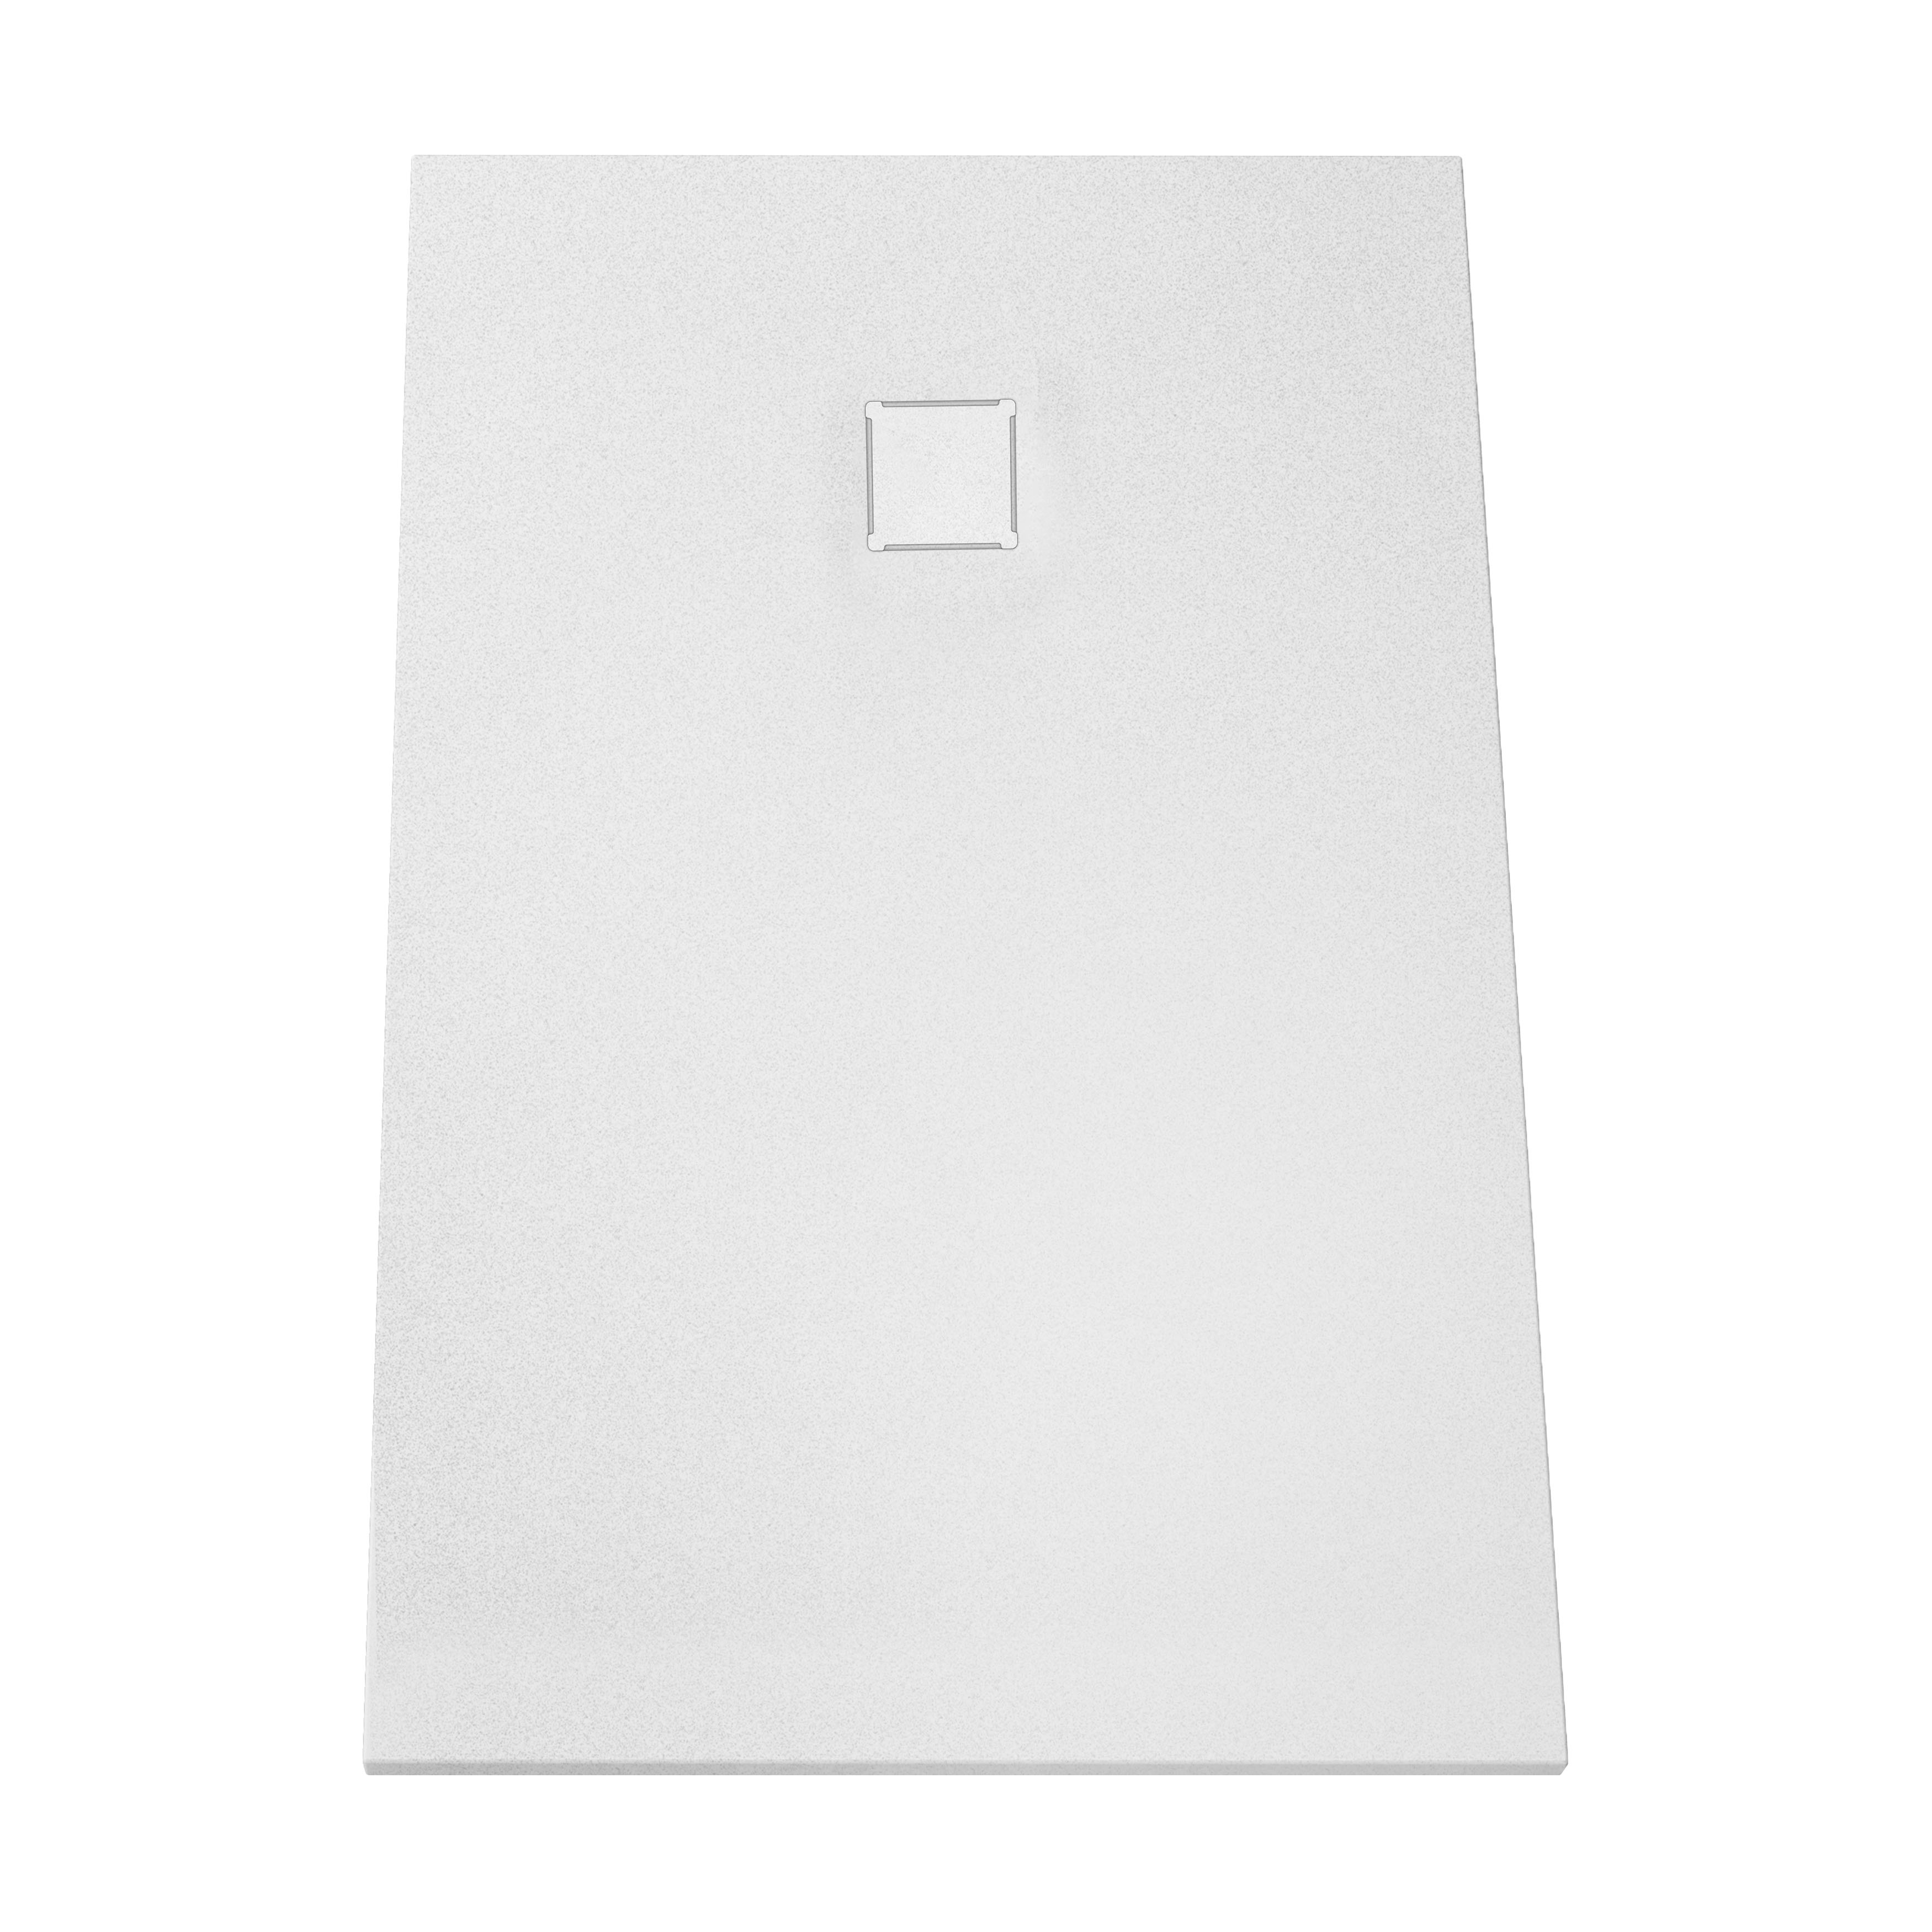 V-stone, receveur ultra plat en solid stone, 140  x  90 cm, blanc